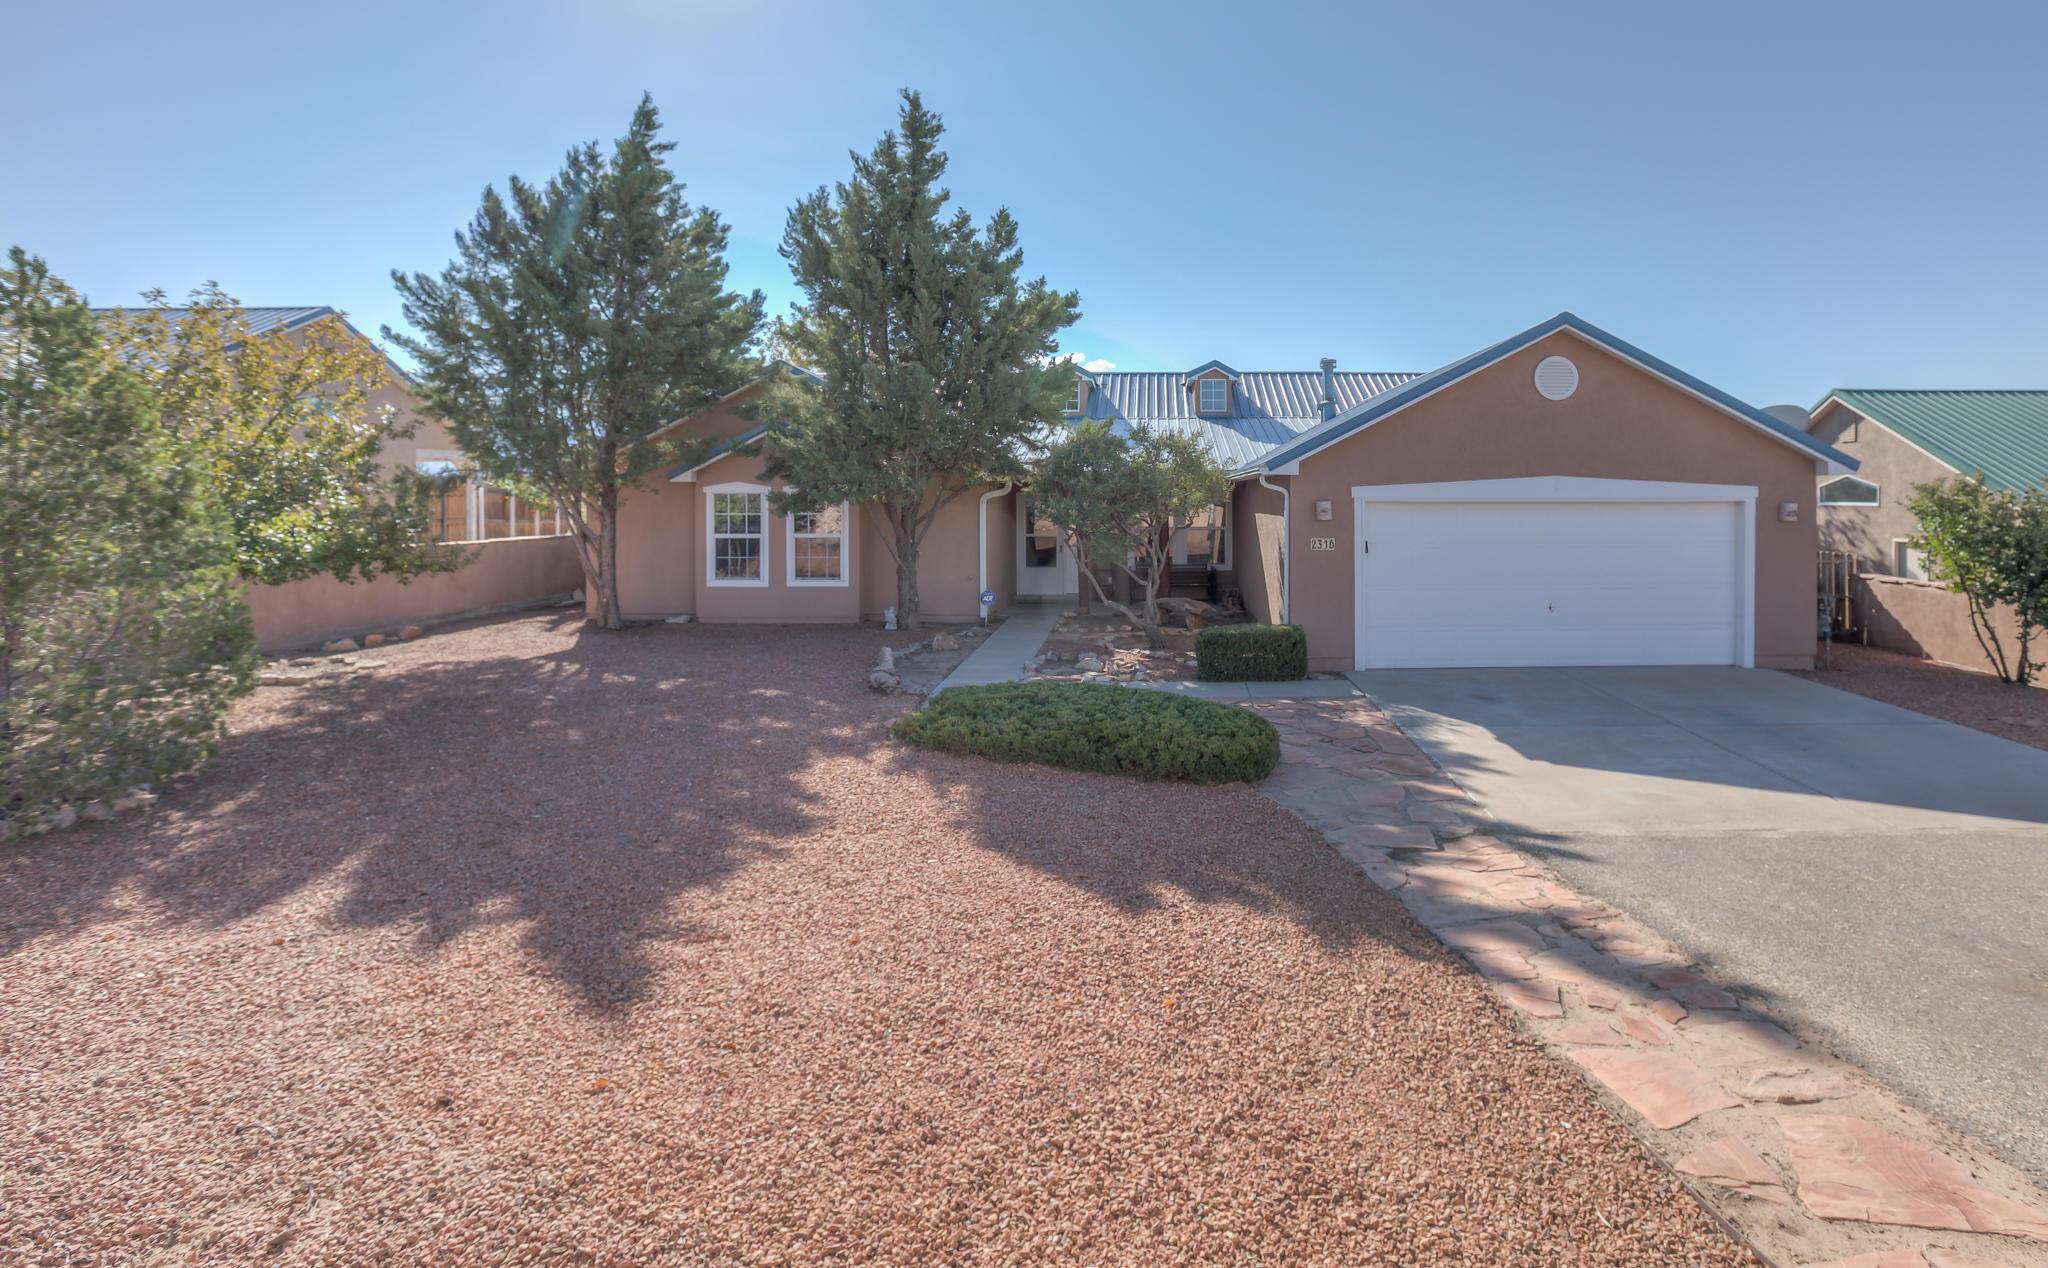 2316 NE Monterrey Road, Rio Rancho in Sandoval County, NM 87144 Home for Sale